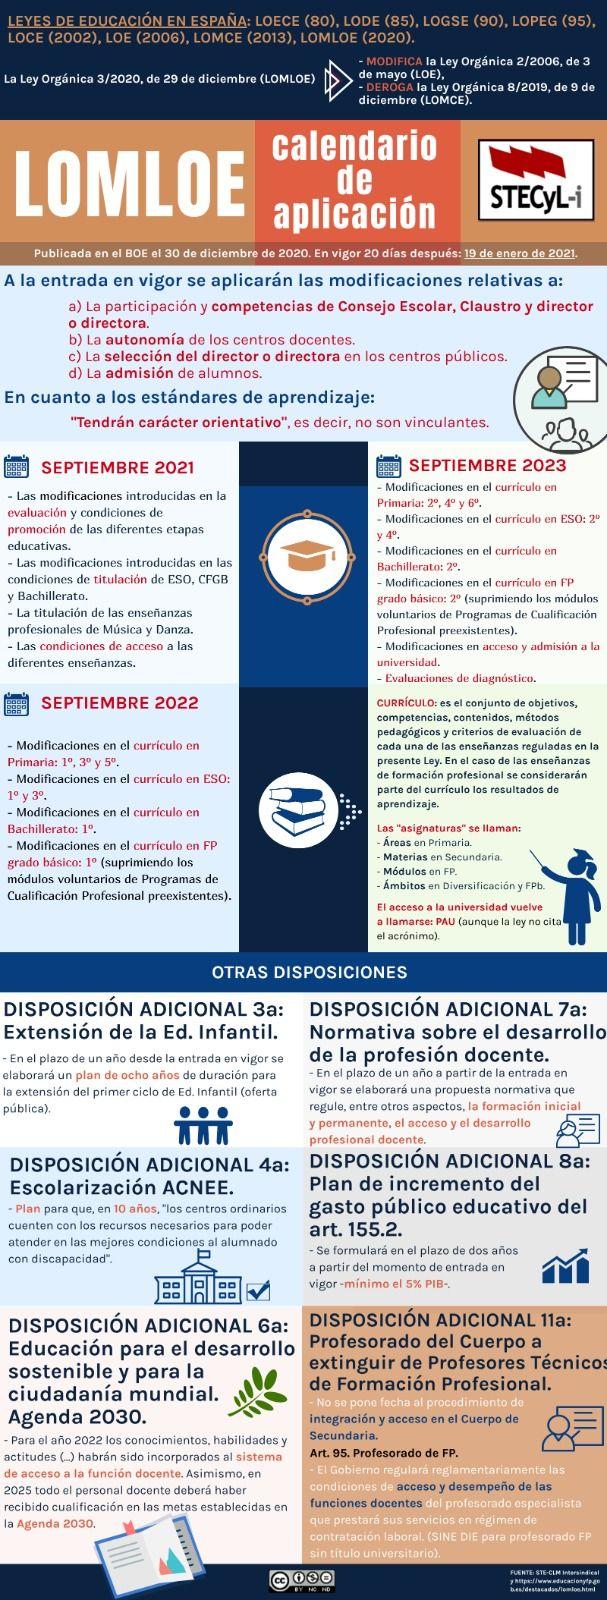 Calendario-Implantacion-LOMLOE-Infografia